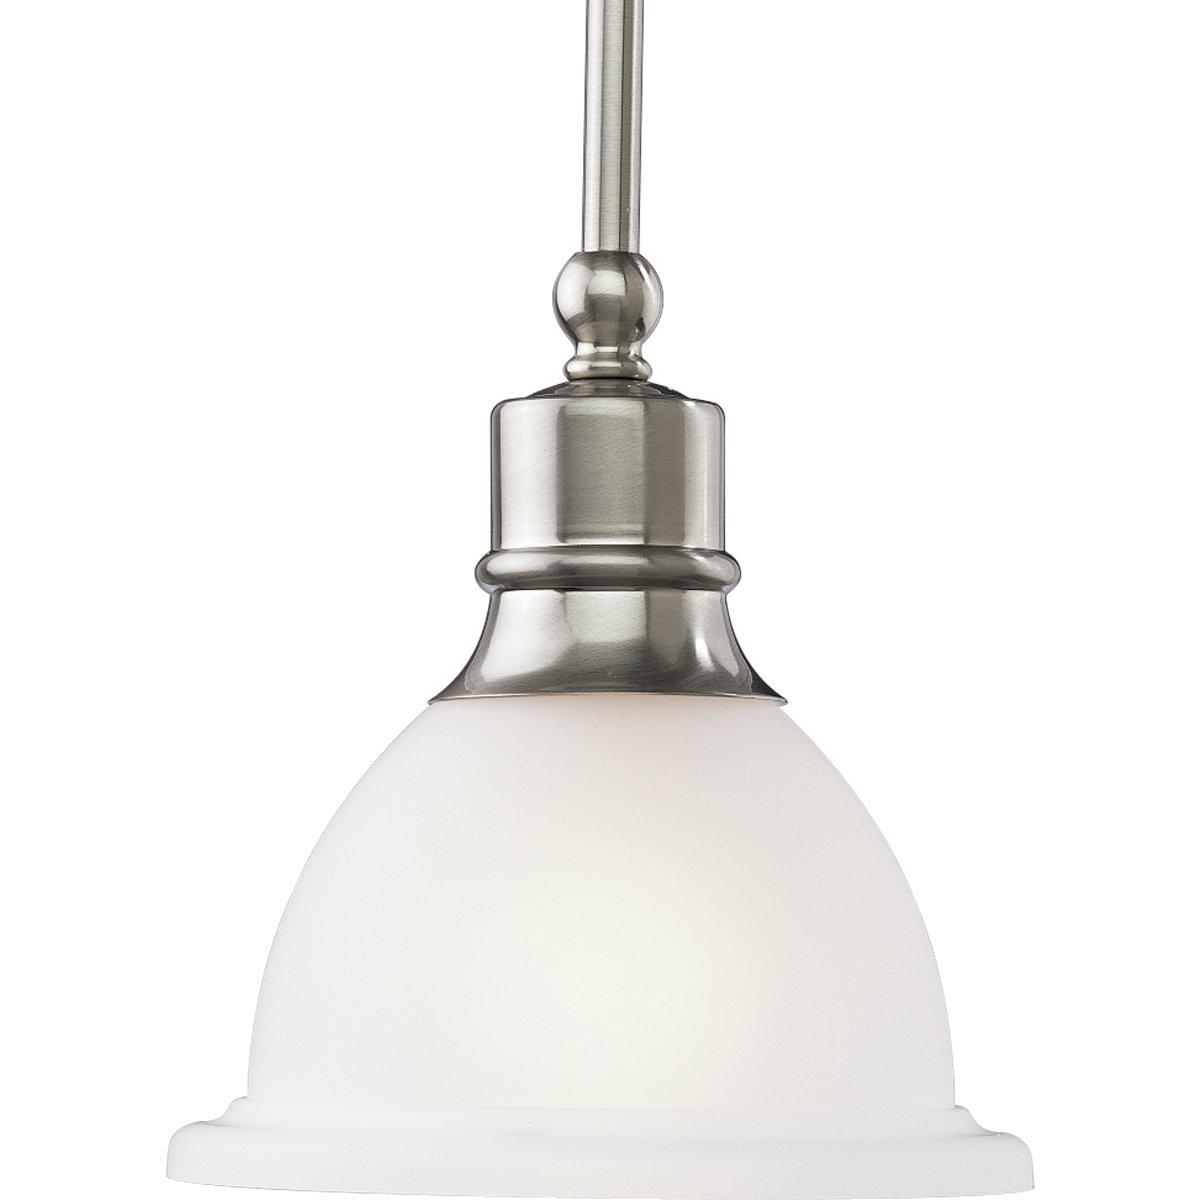 Vangorder 1 Light Single Bell Pendant Throughout Recent Abernathy 1 Light Dome Pendants (View 13 of 25)